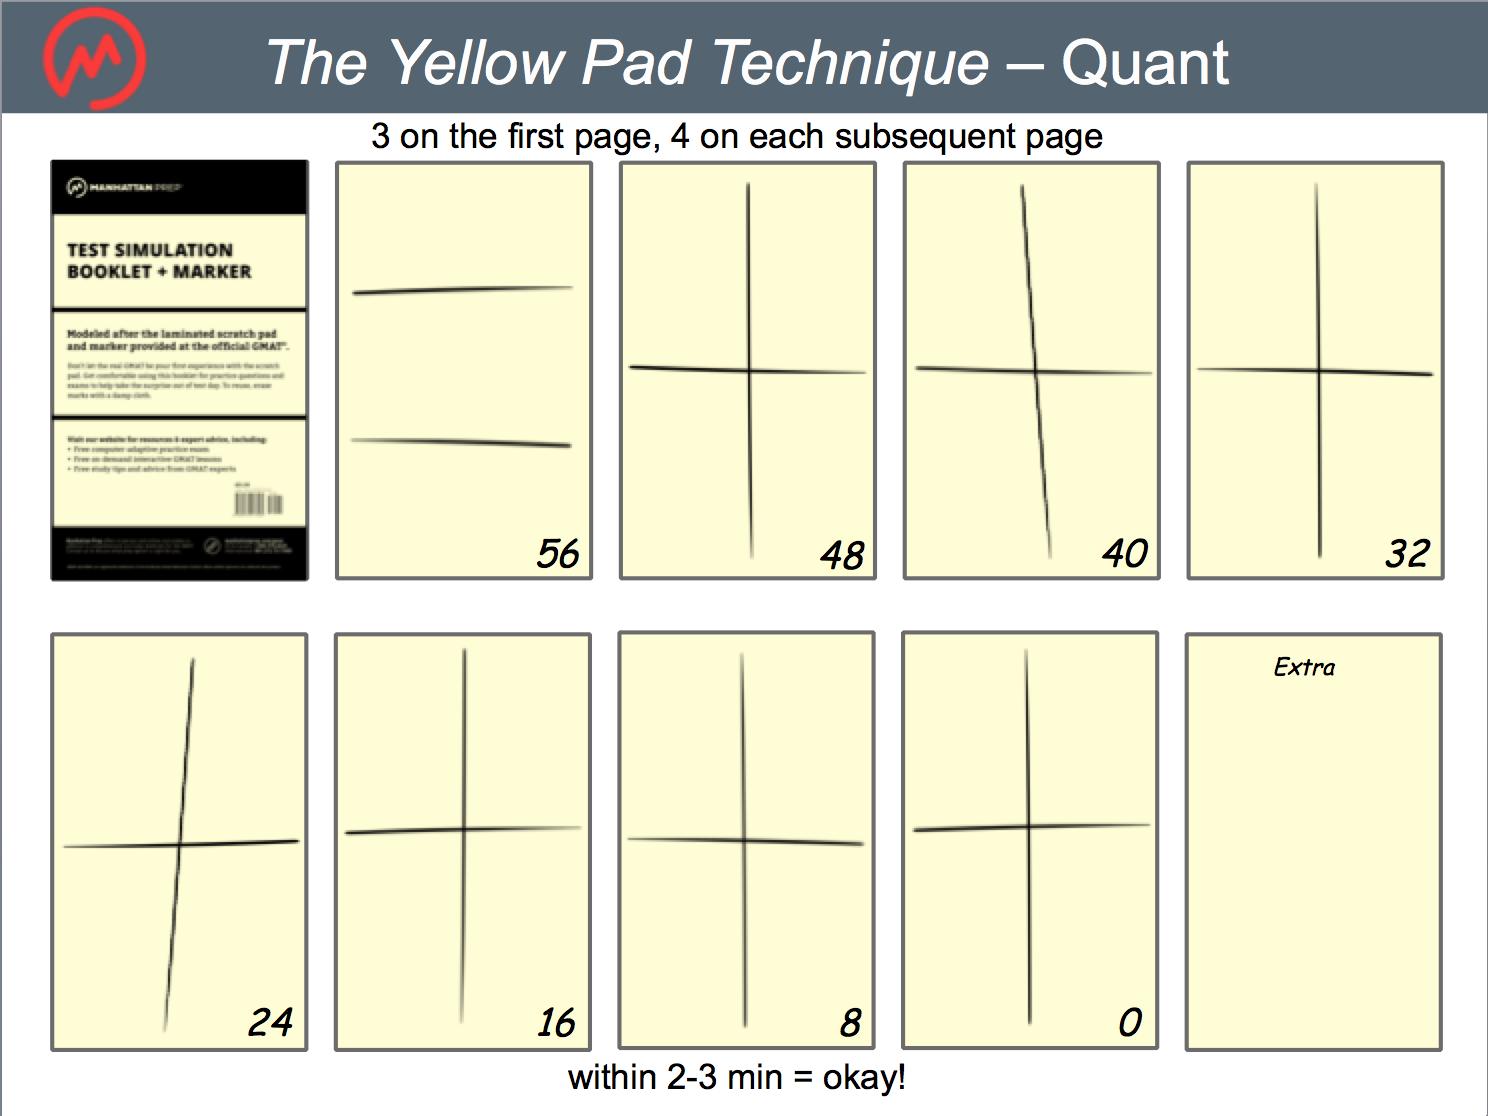 quant-yellow-pad-apr2018.png